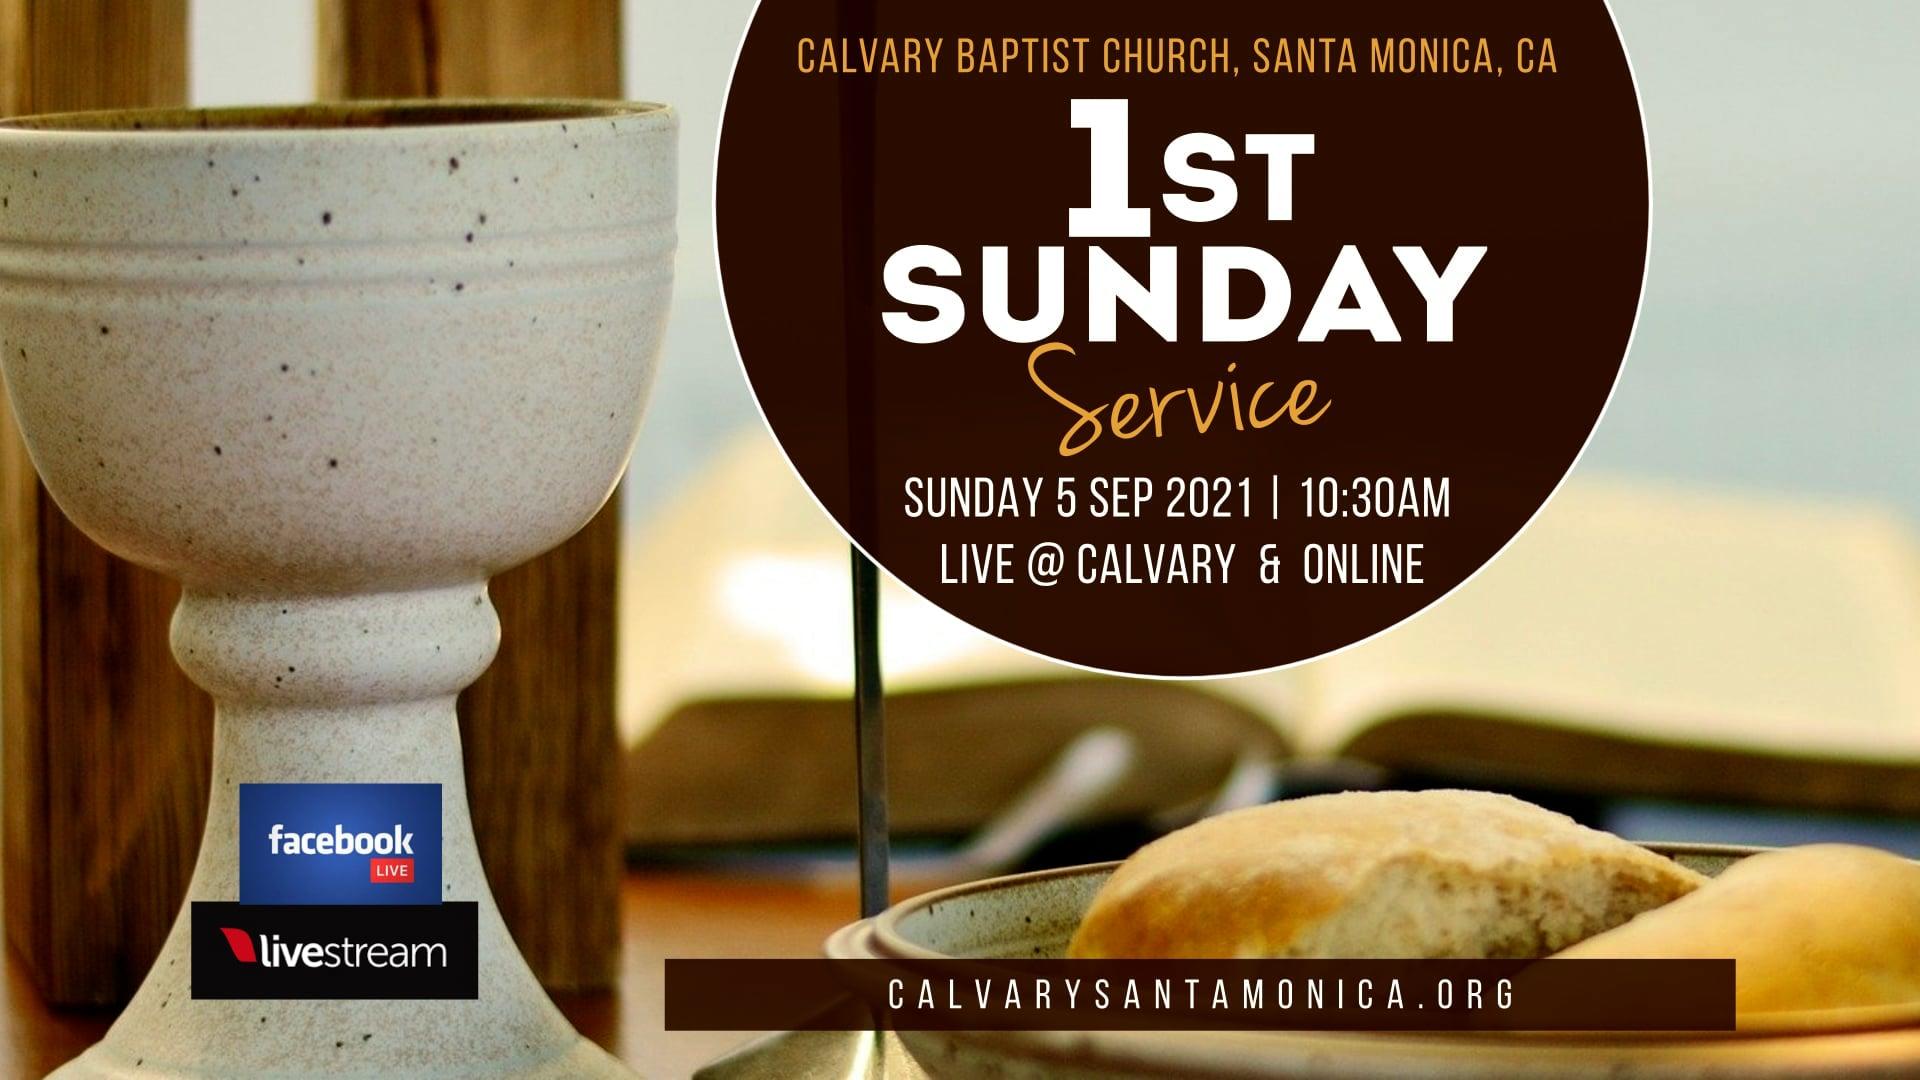 09.05.21 Calvary Baptist Church Worship Service